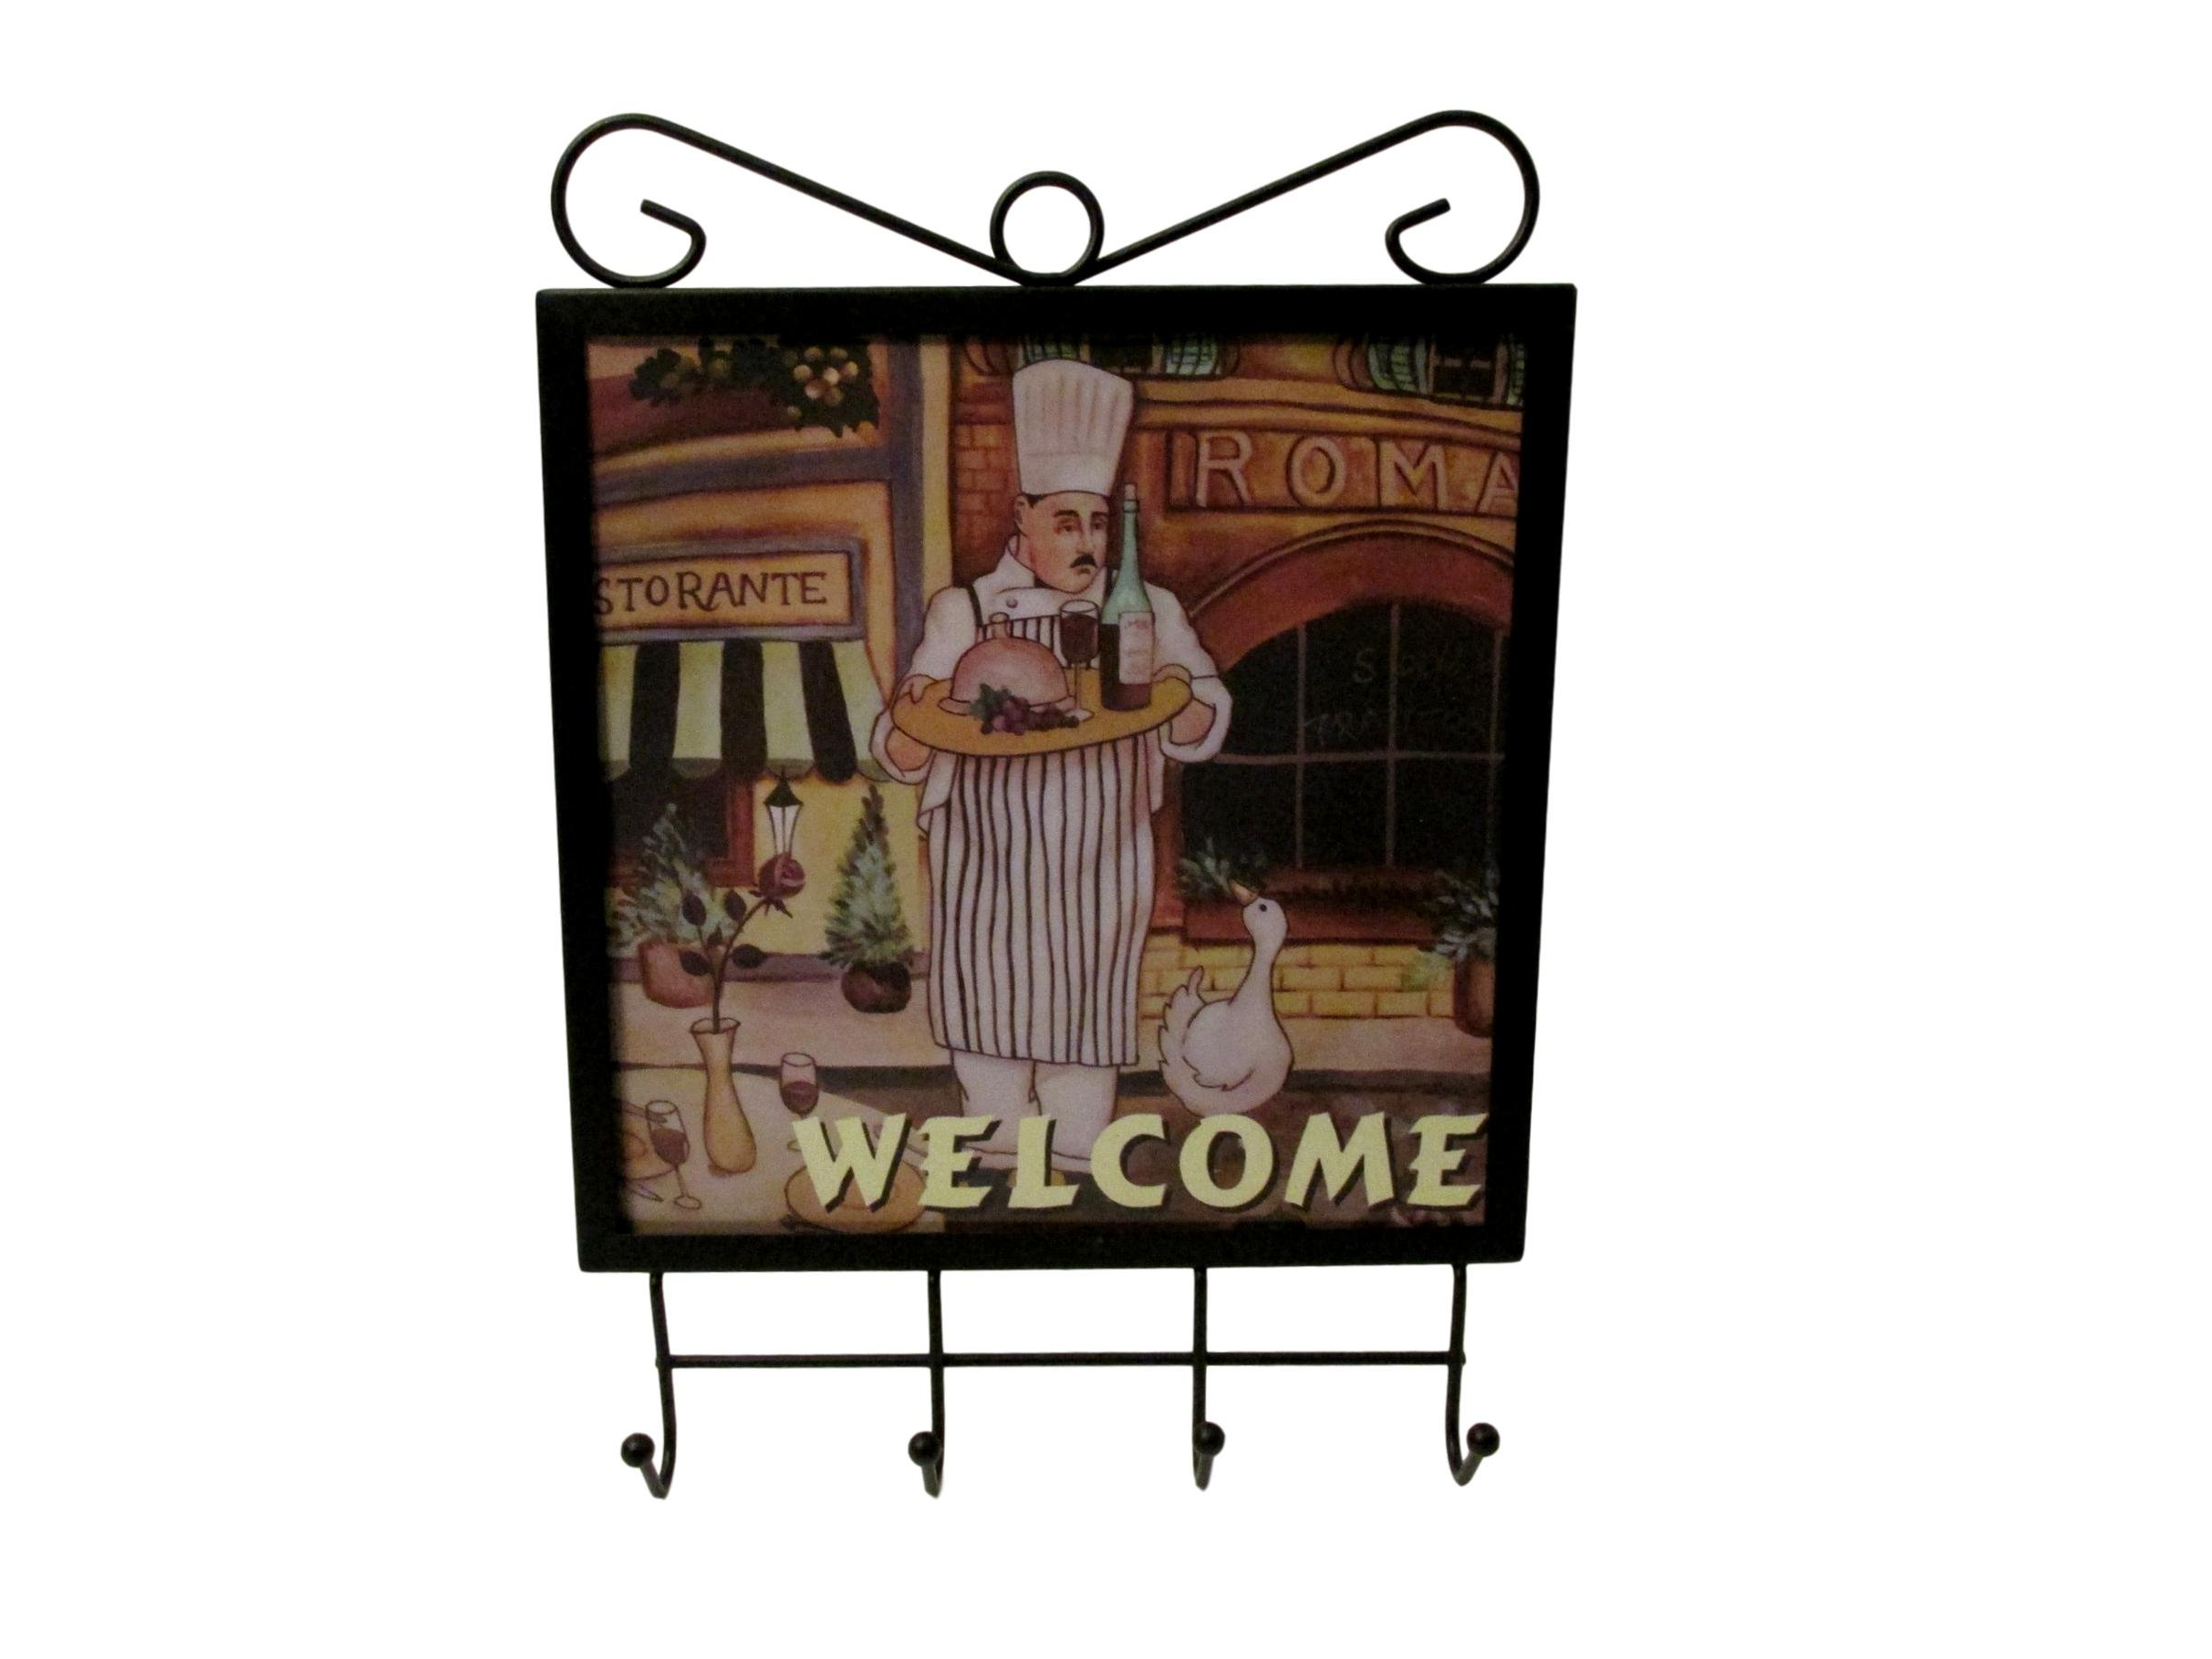 Bonita Home Sophia Essentials Fat Chef Culinary Wall Hook For Towels, Keys, Aprons, Utensils (Wine)